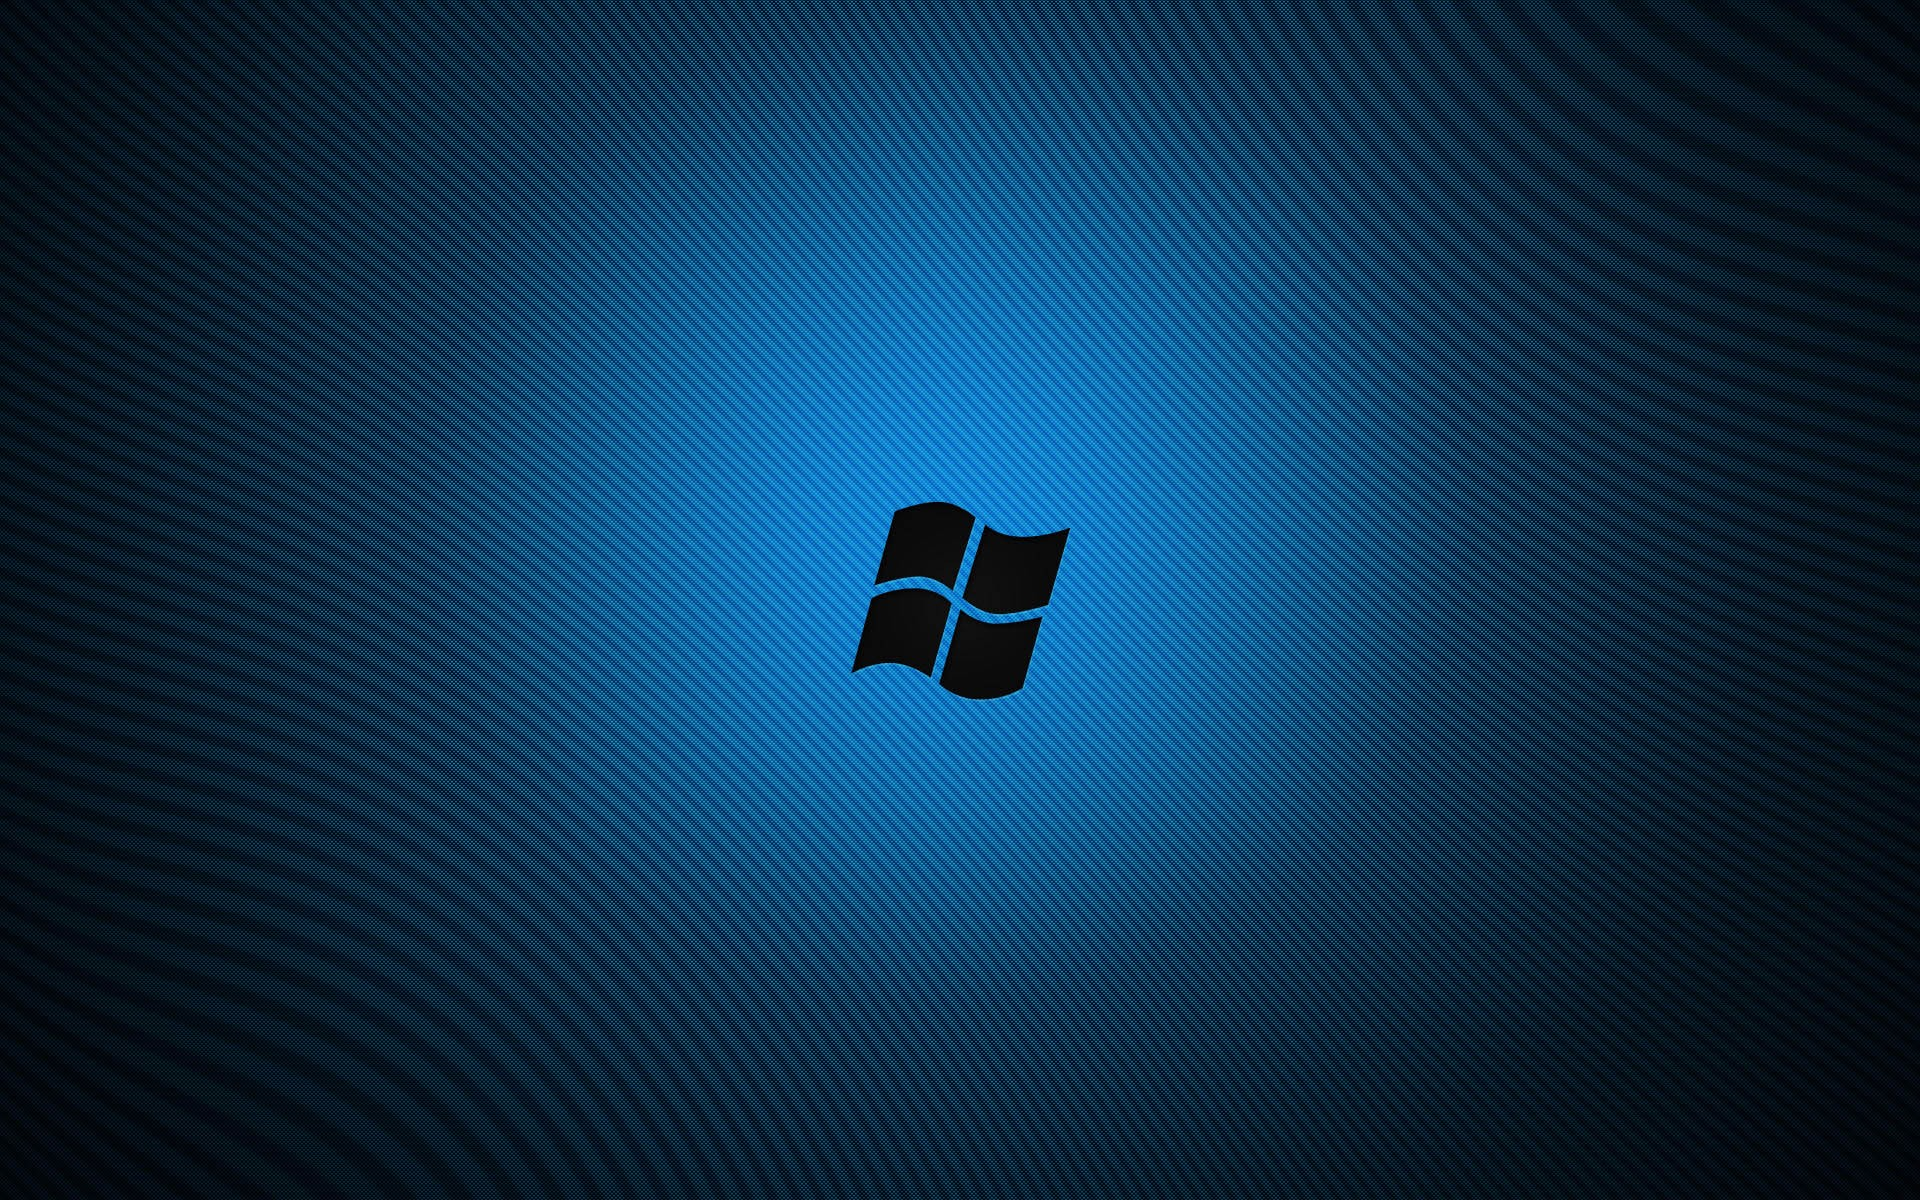 Download Computers Windows Wallpaper 1920x1200 Wallpoper 426914 1920x1200